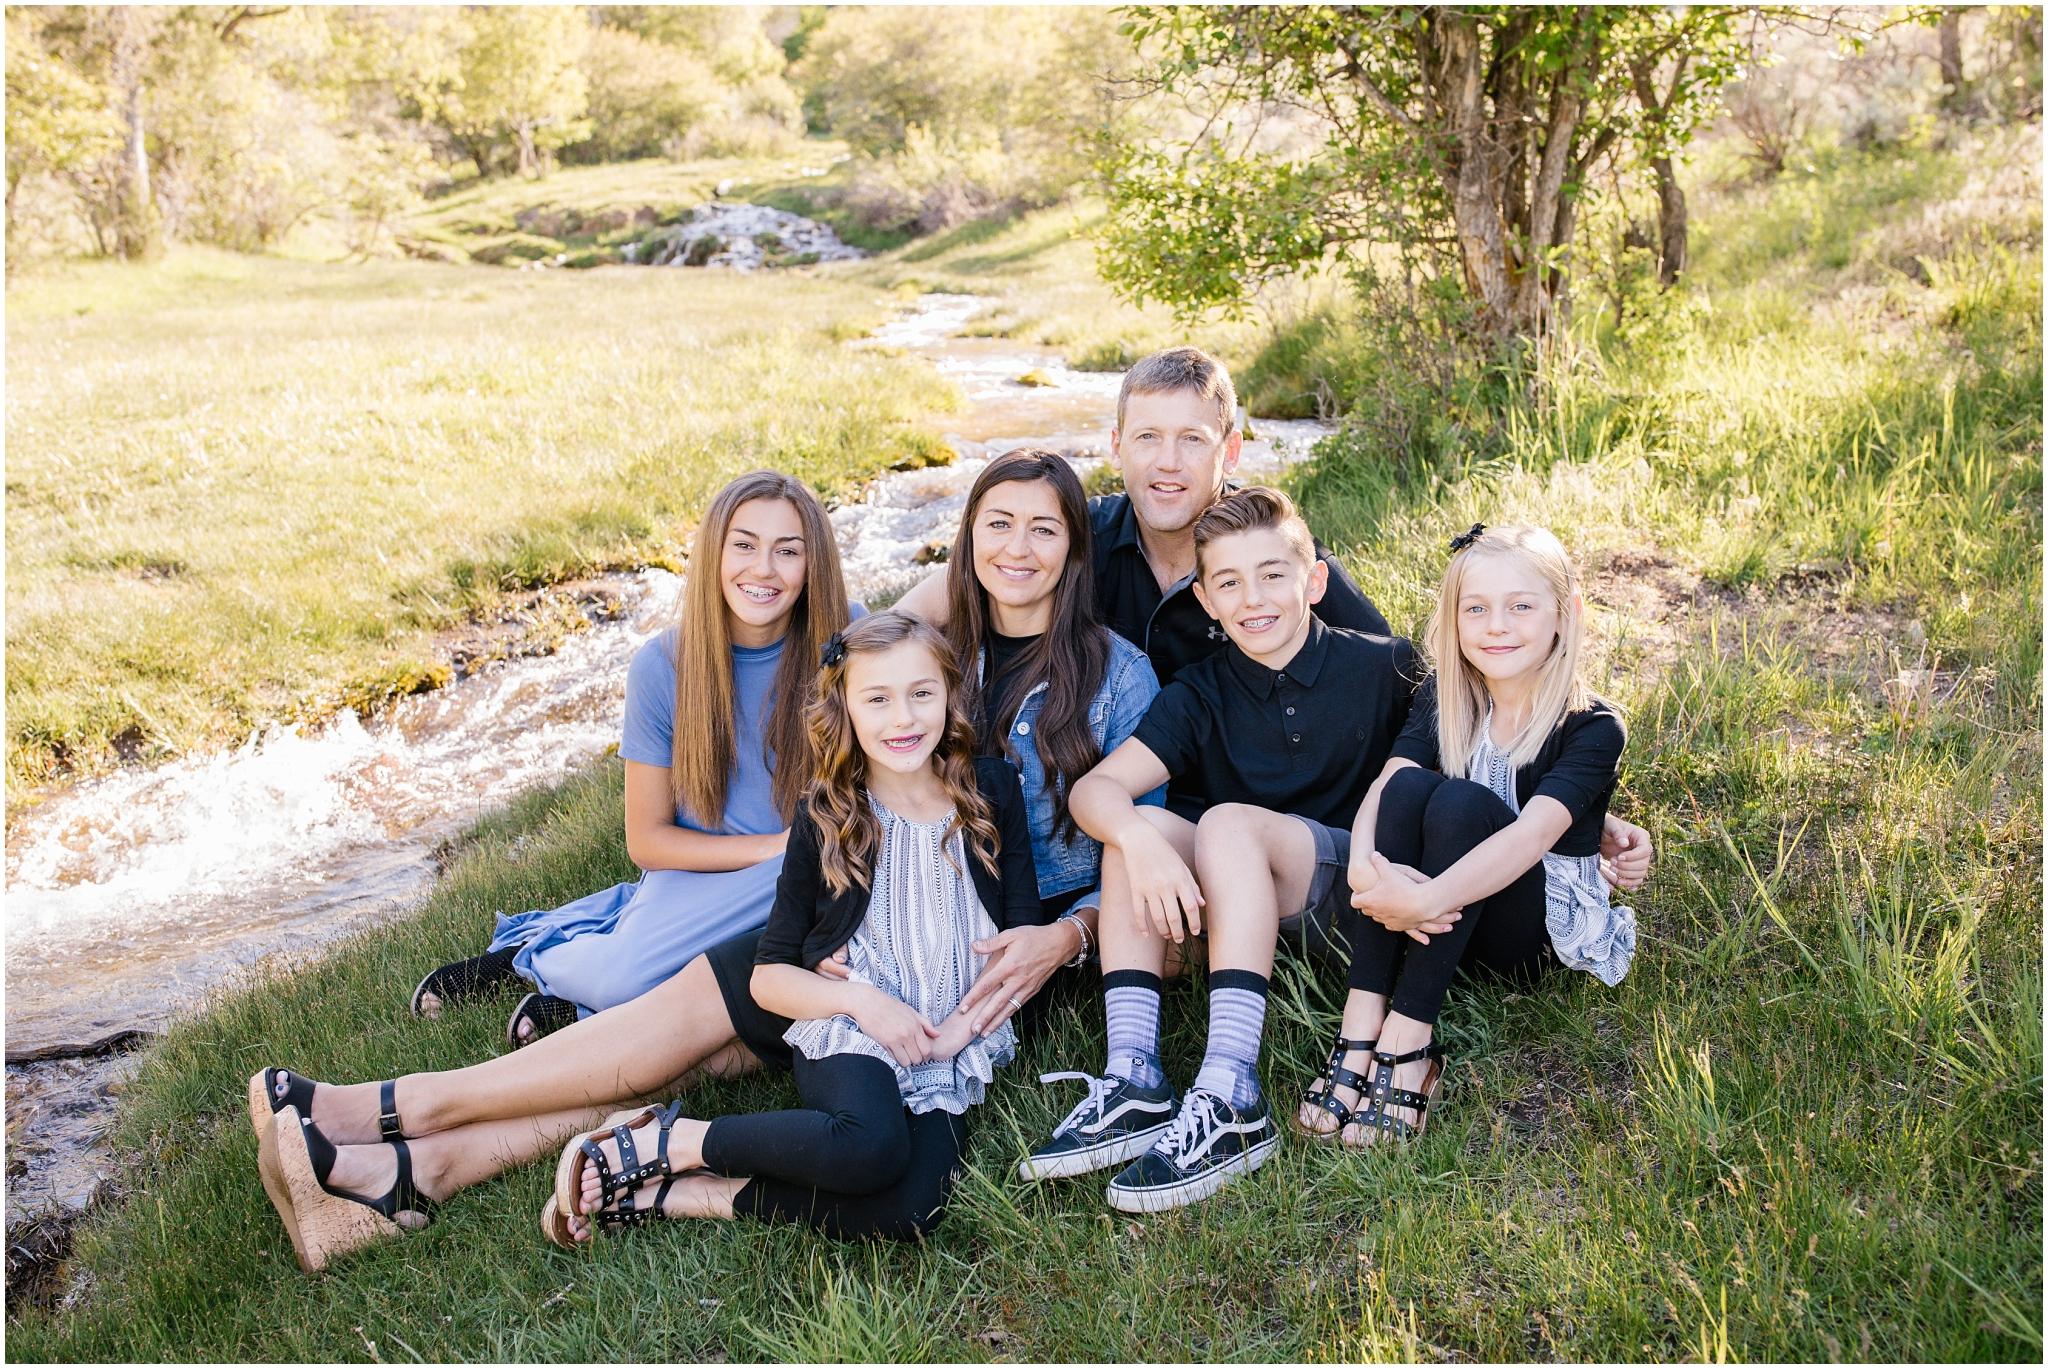 Bagley-53_Lizzie-B-Imagery-Utah-Family-Photographer-Central-Utah-Photographer-Utah-County-Extended-Family.jpg